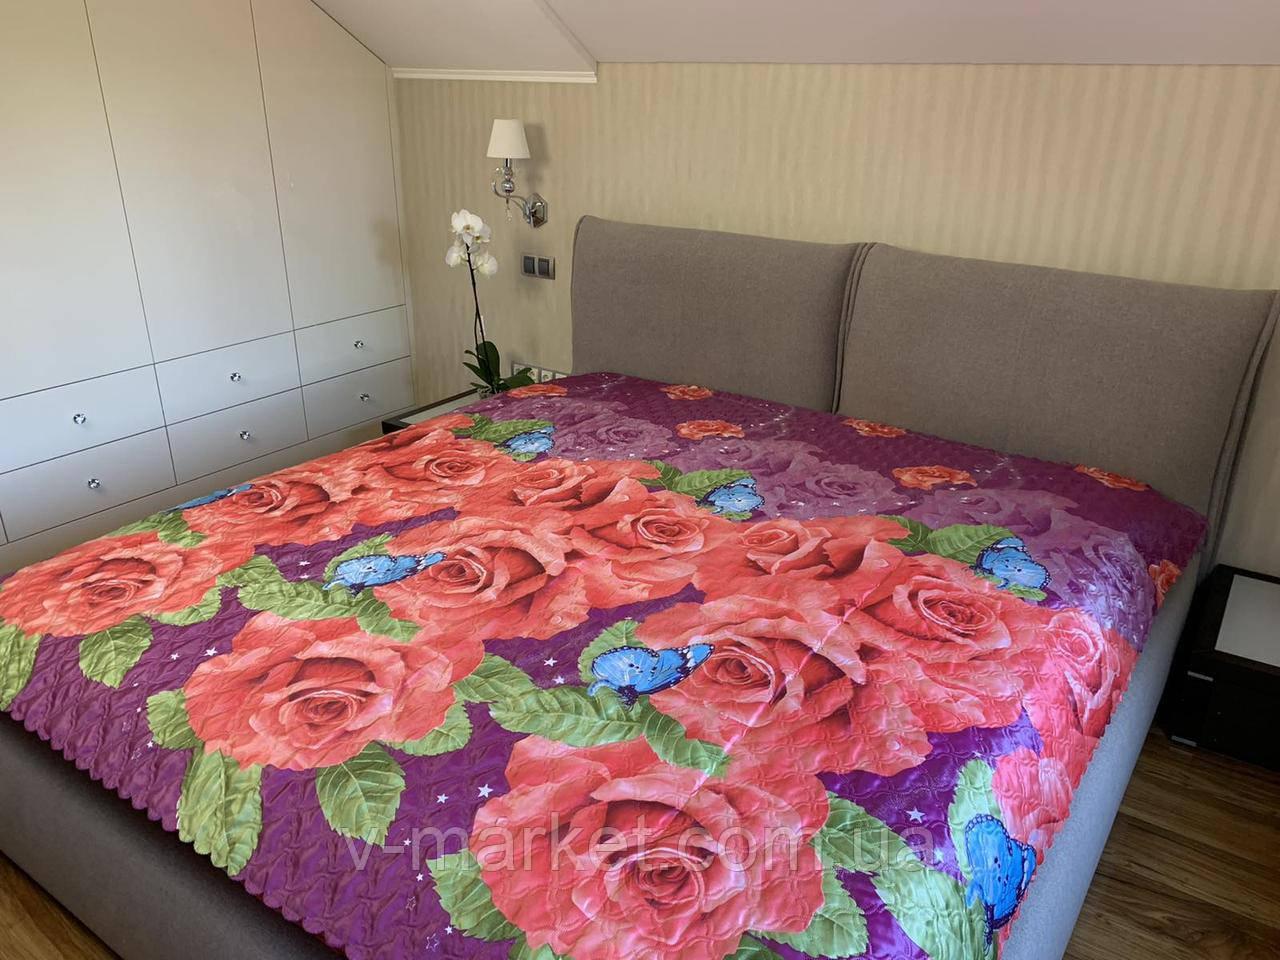 Атласное летнее одеяло покрывало евро размер, 195/205